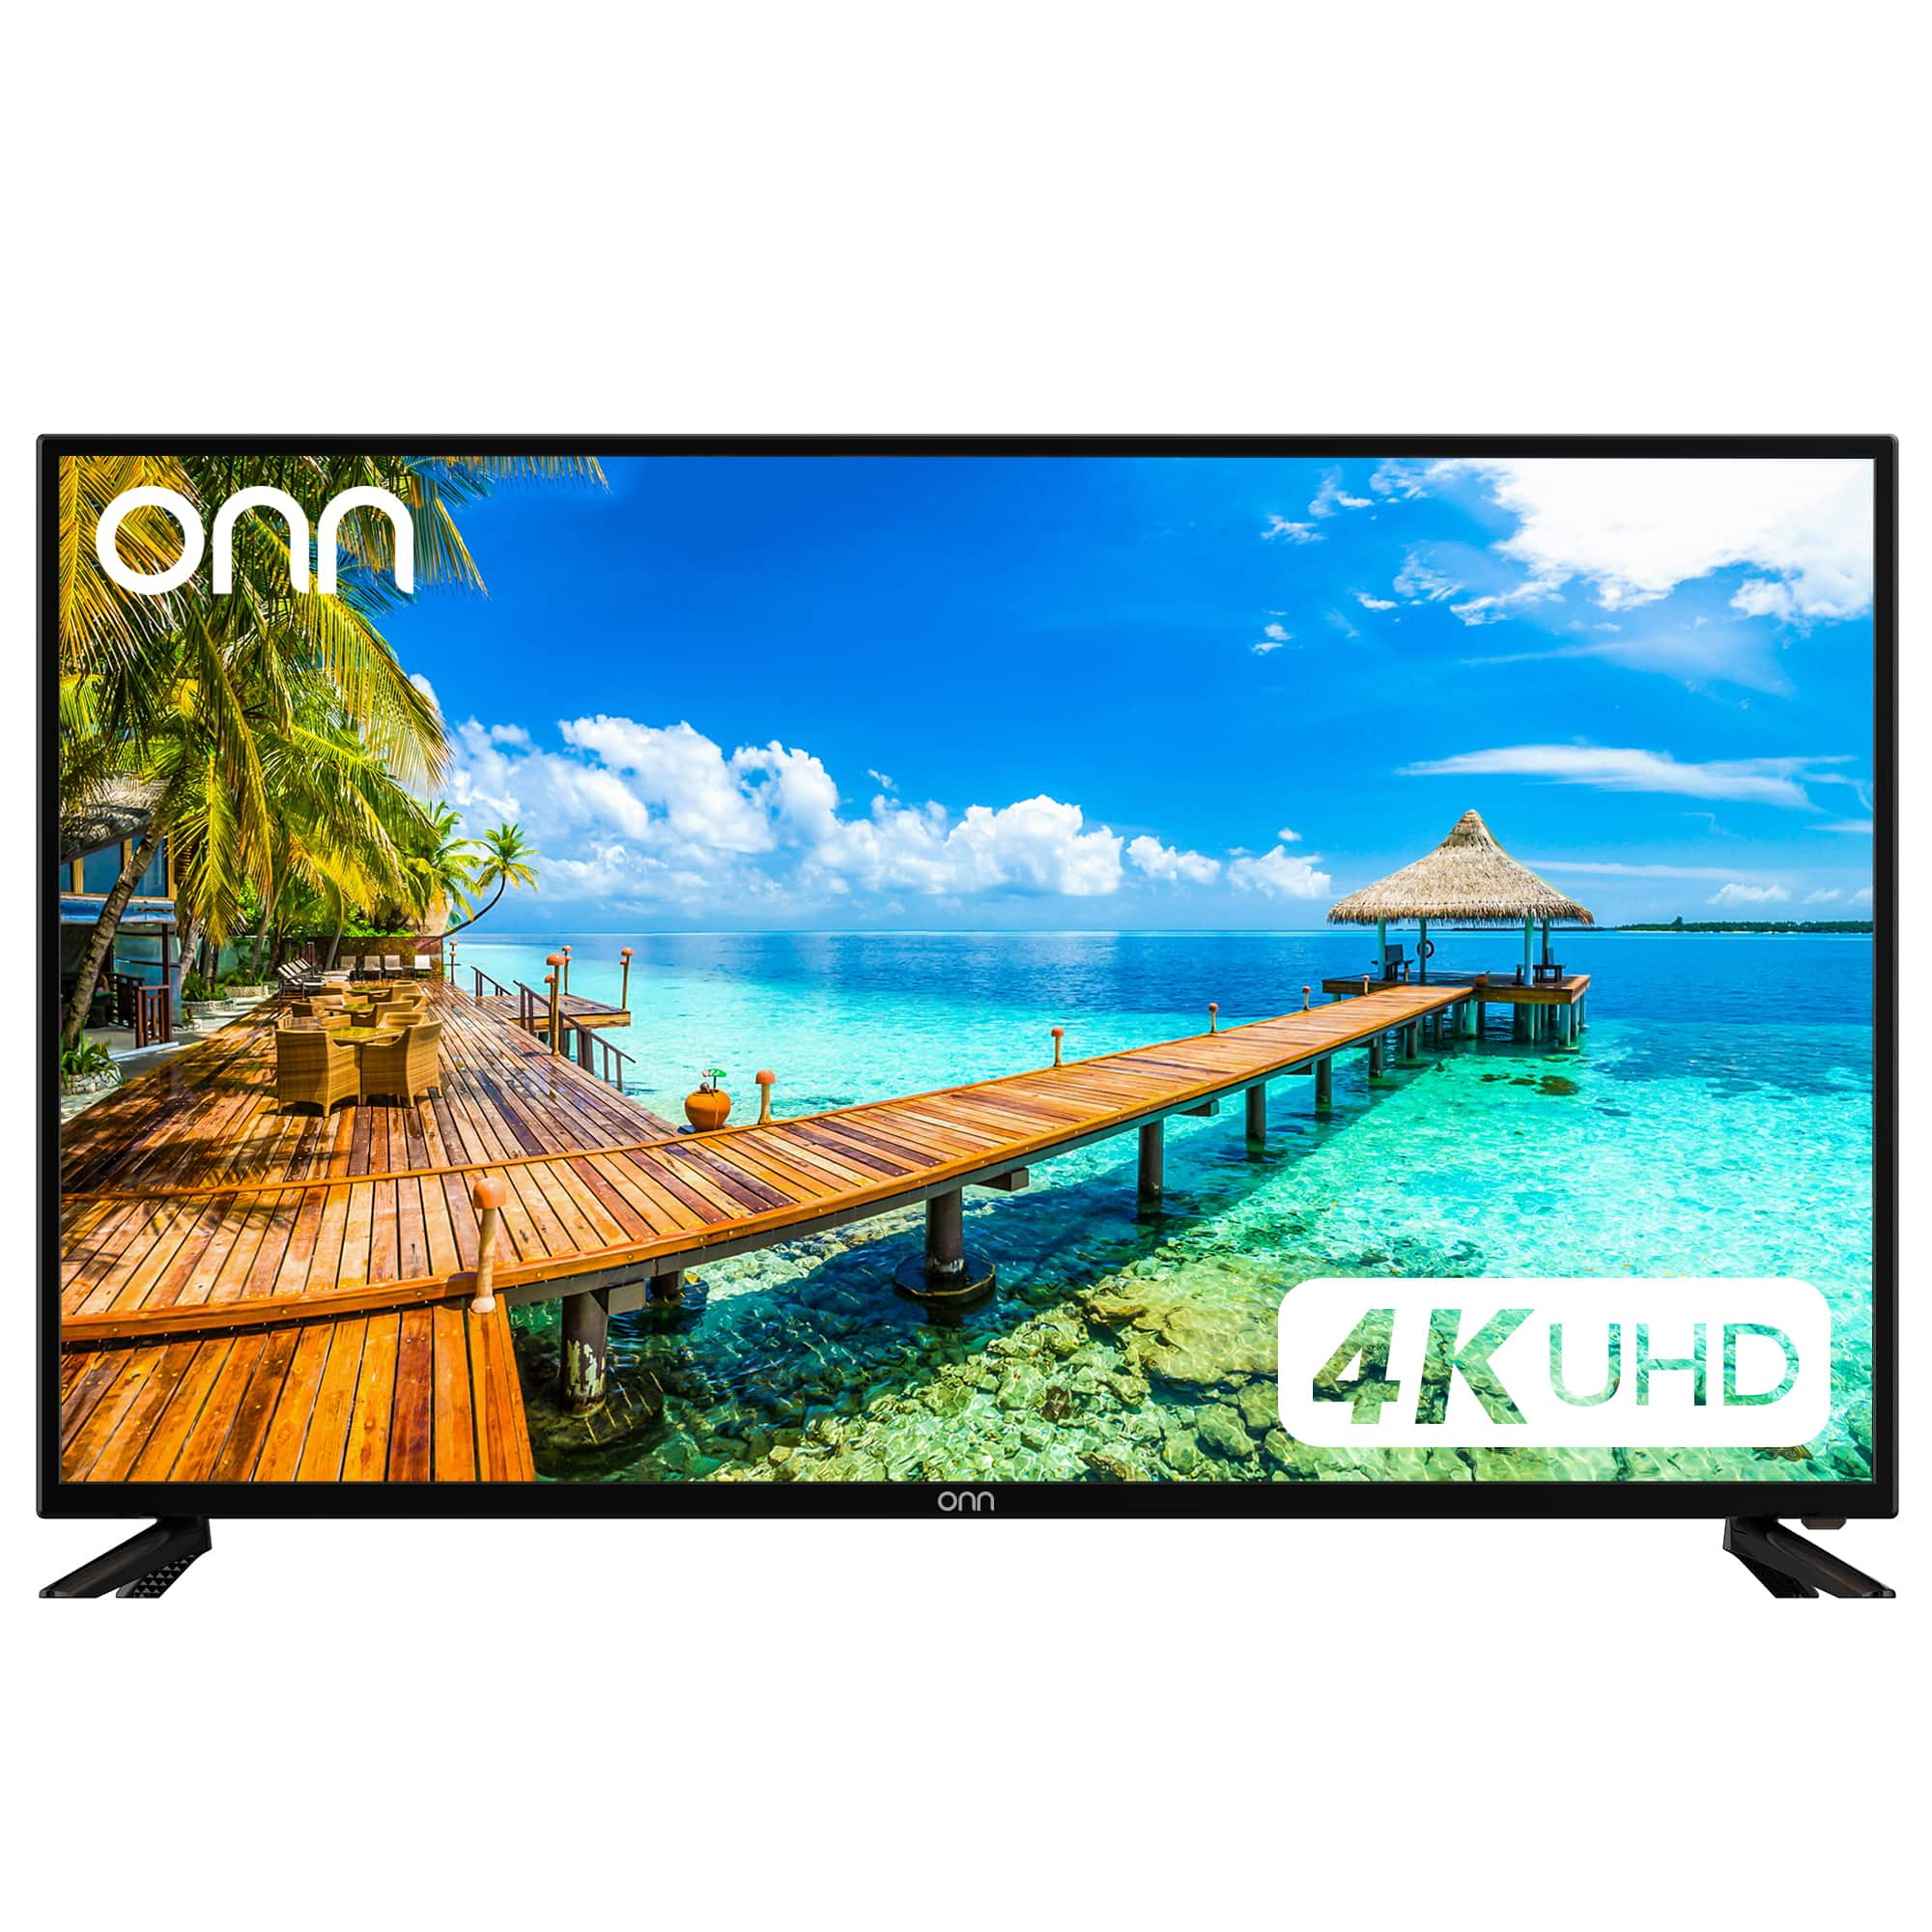 ONN 43 inch 4k TV $69 B&M YMMV